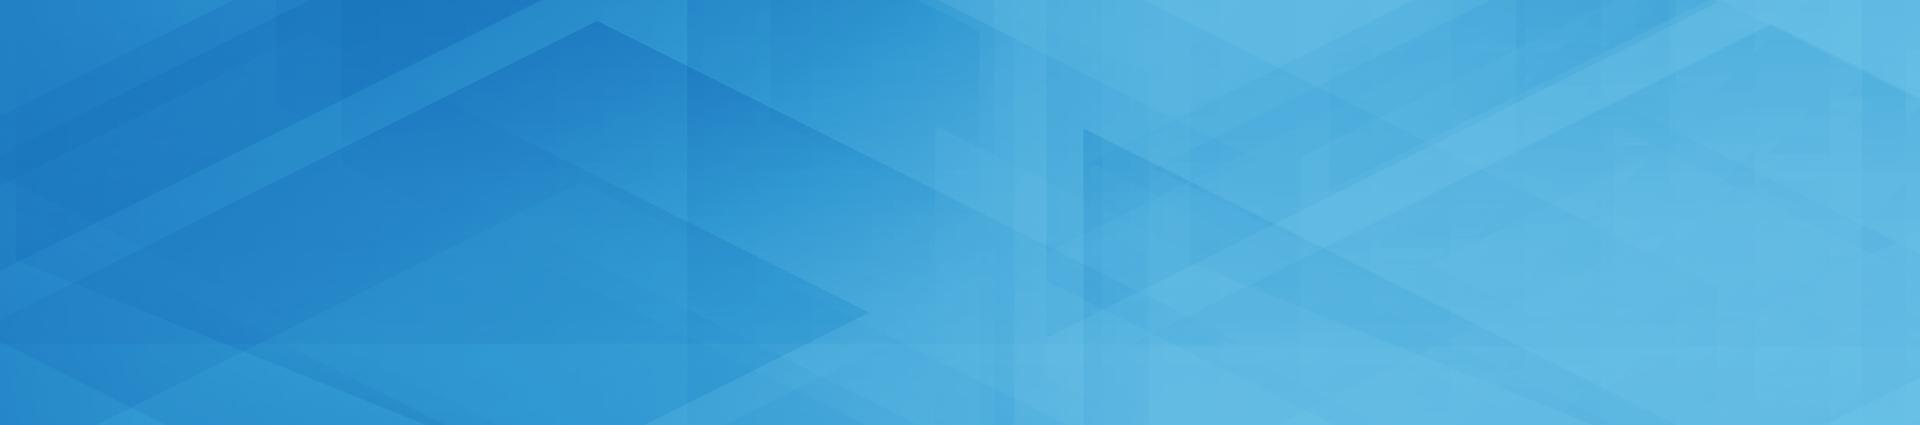 Banner_Inbest_Textura_soluciones.png